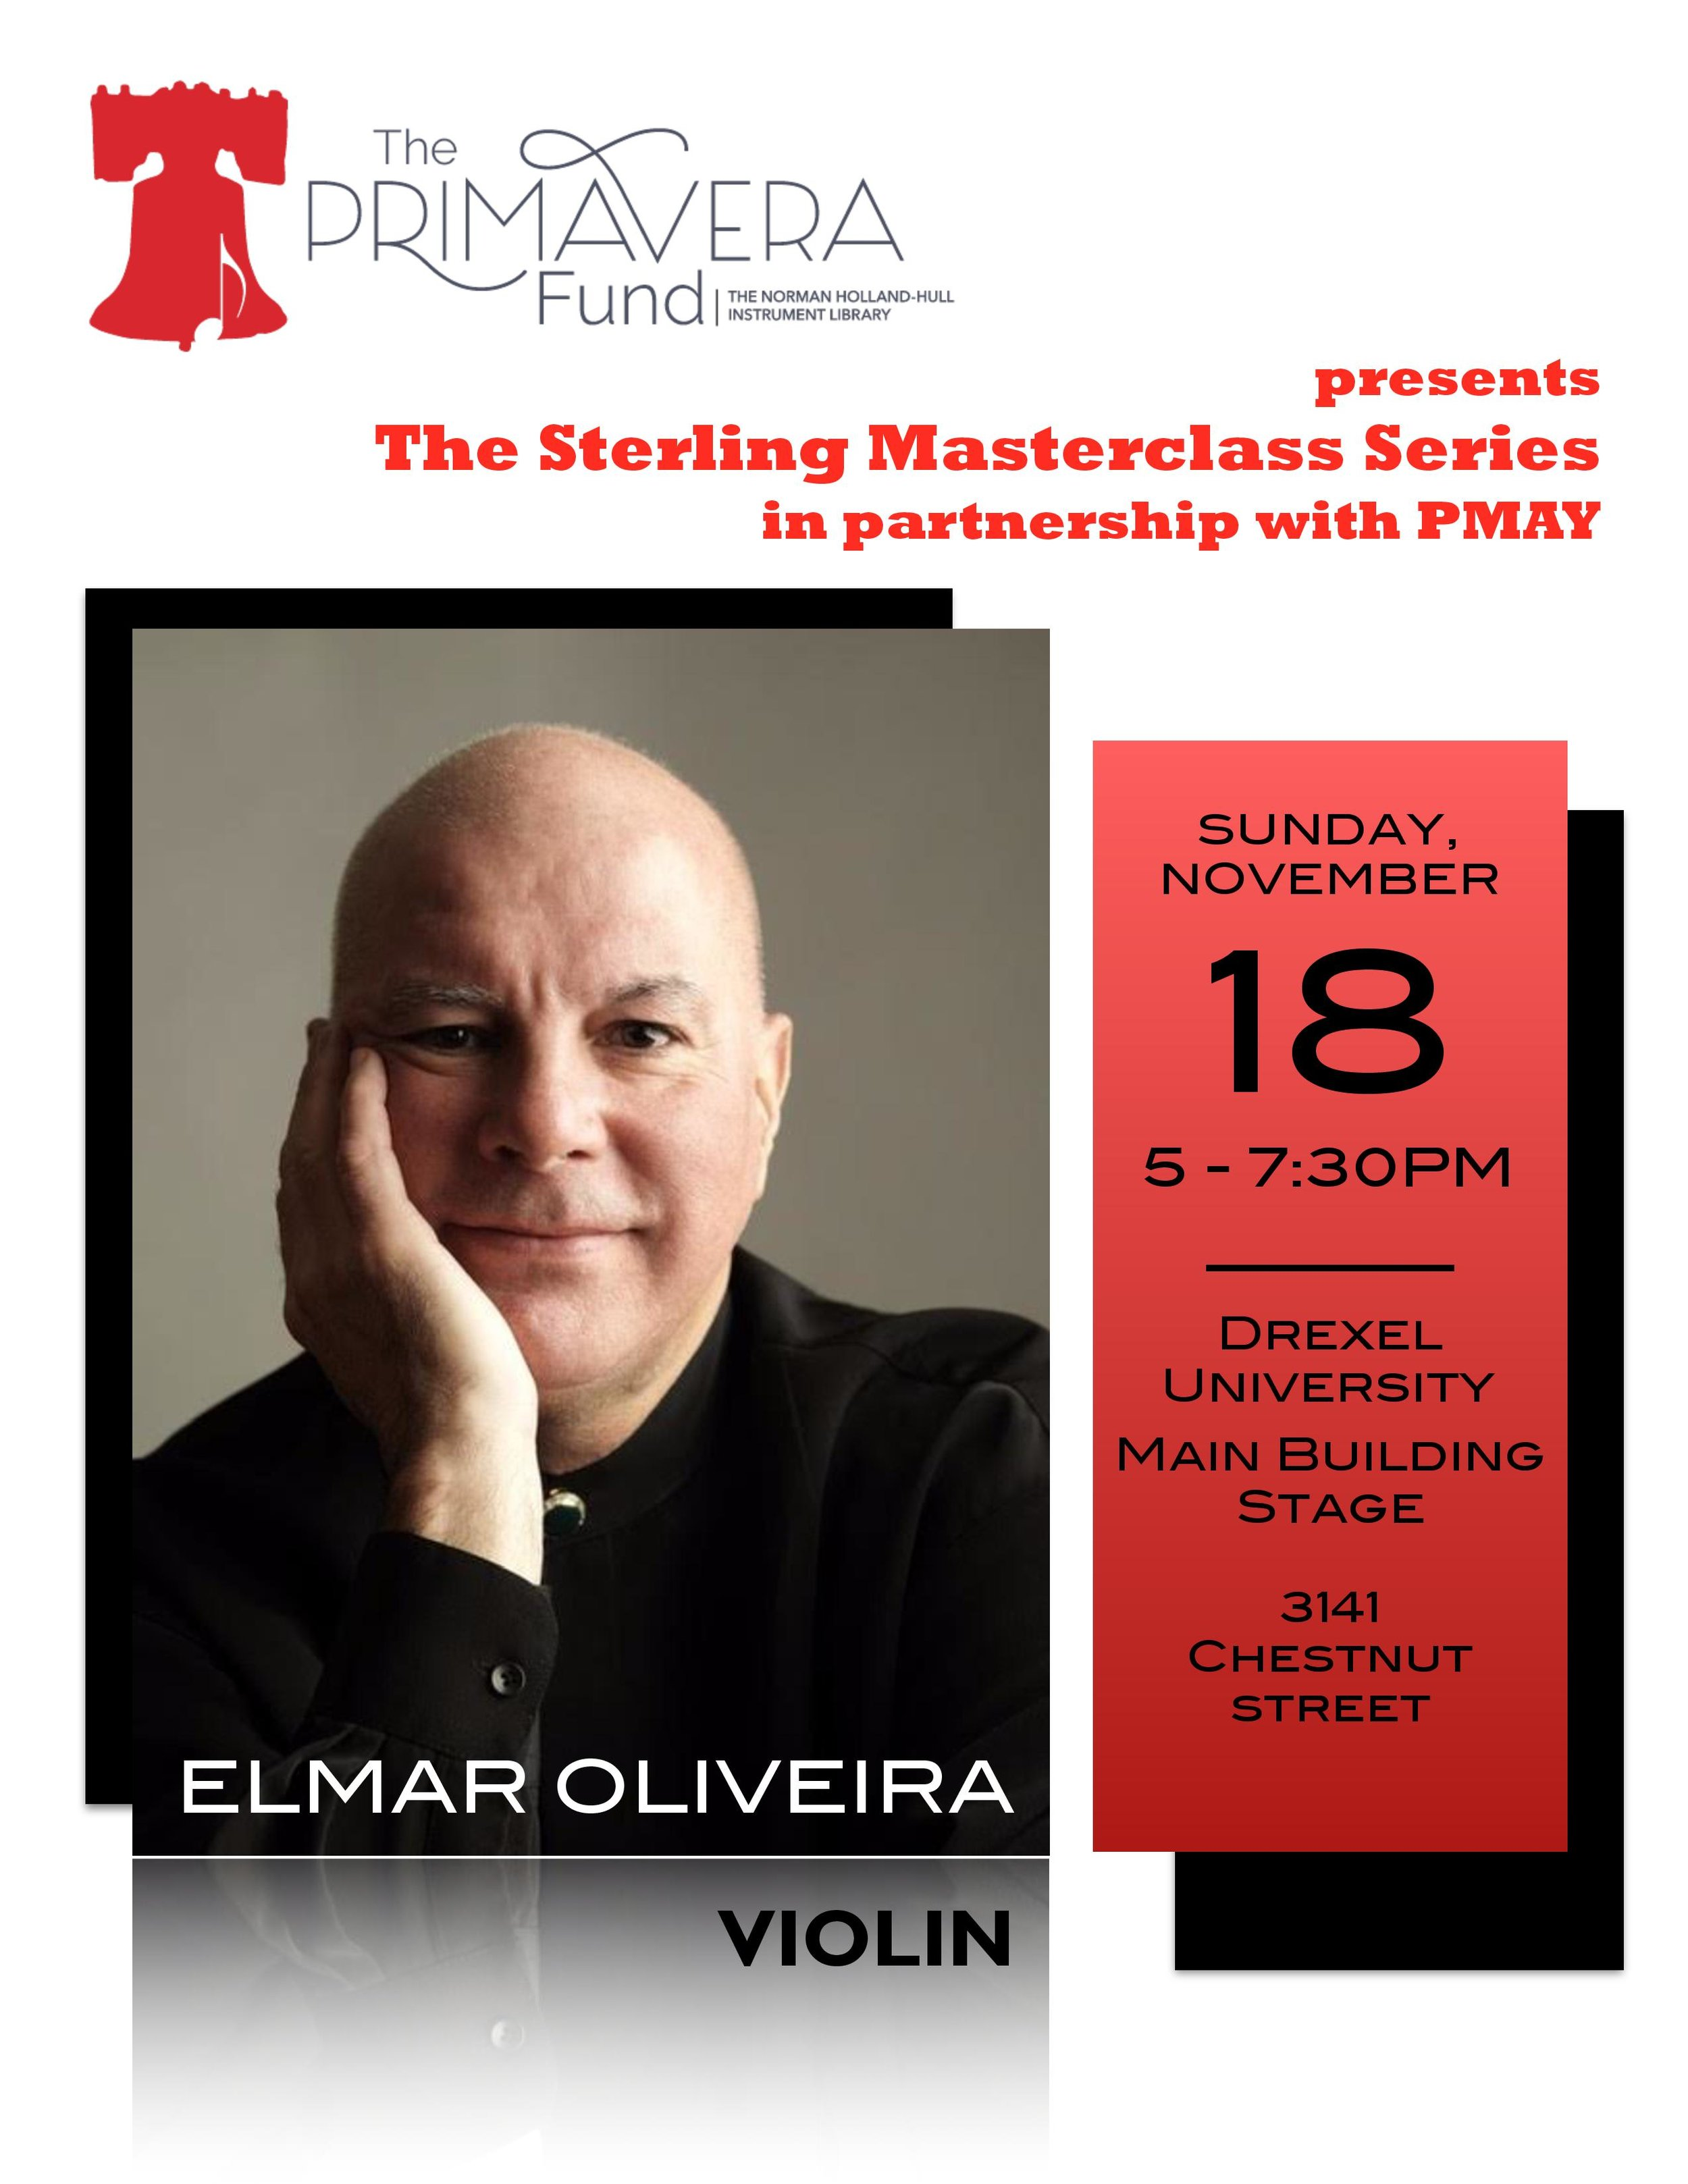 2018.11.18 - Primavera Fund Masterclass with Elmar Olivera.jpg